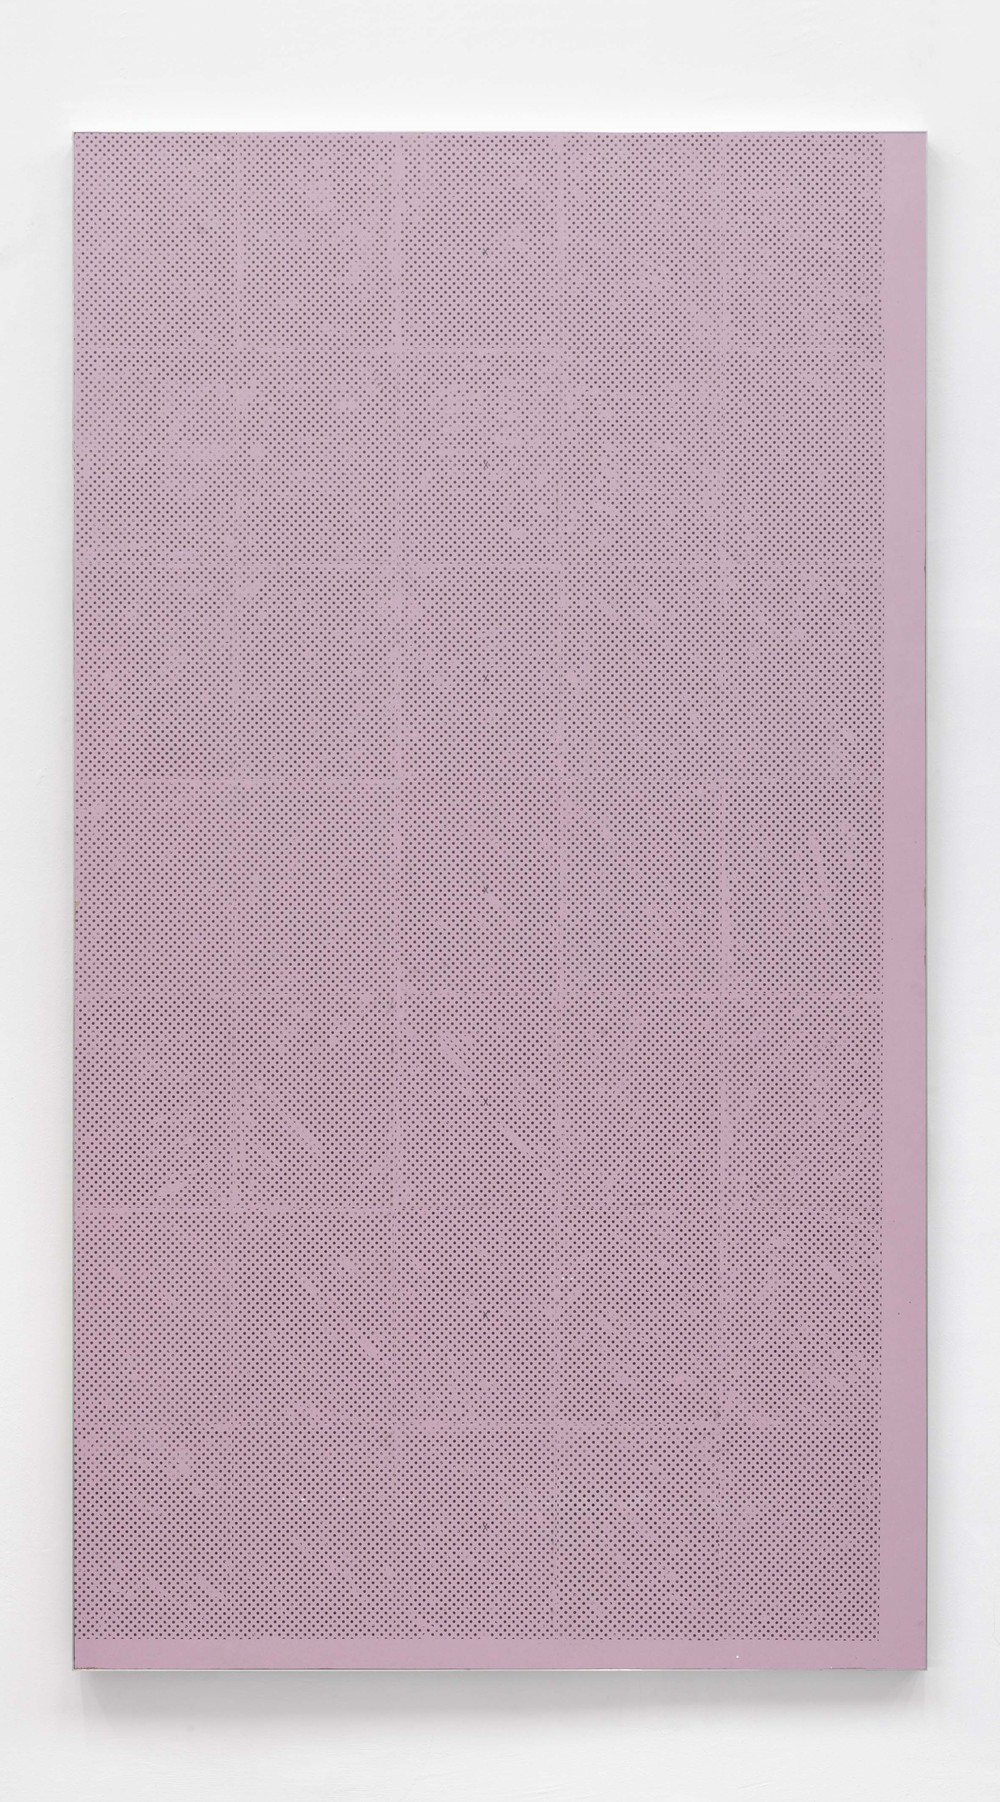 Nick Oberthaler,Untitled, 2015